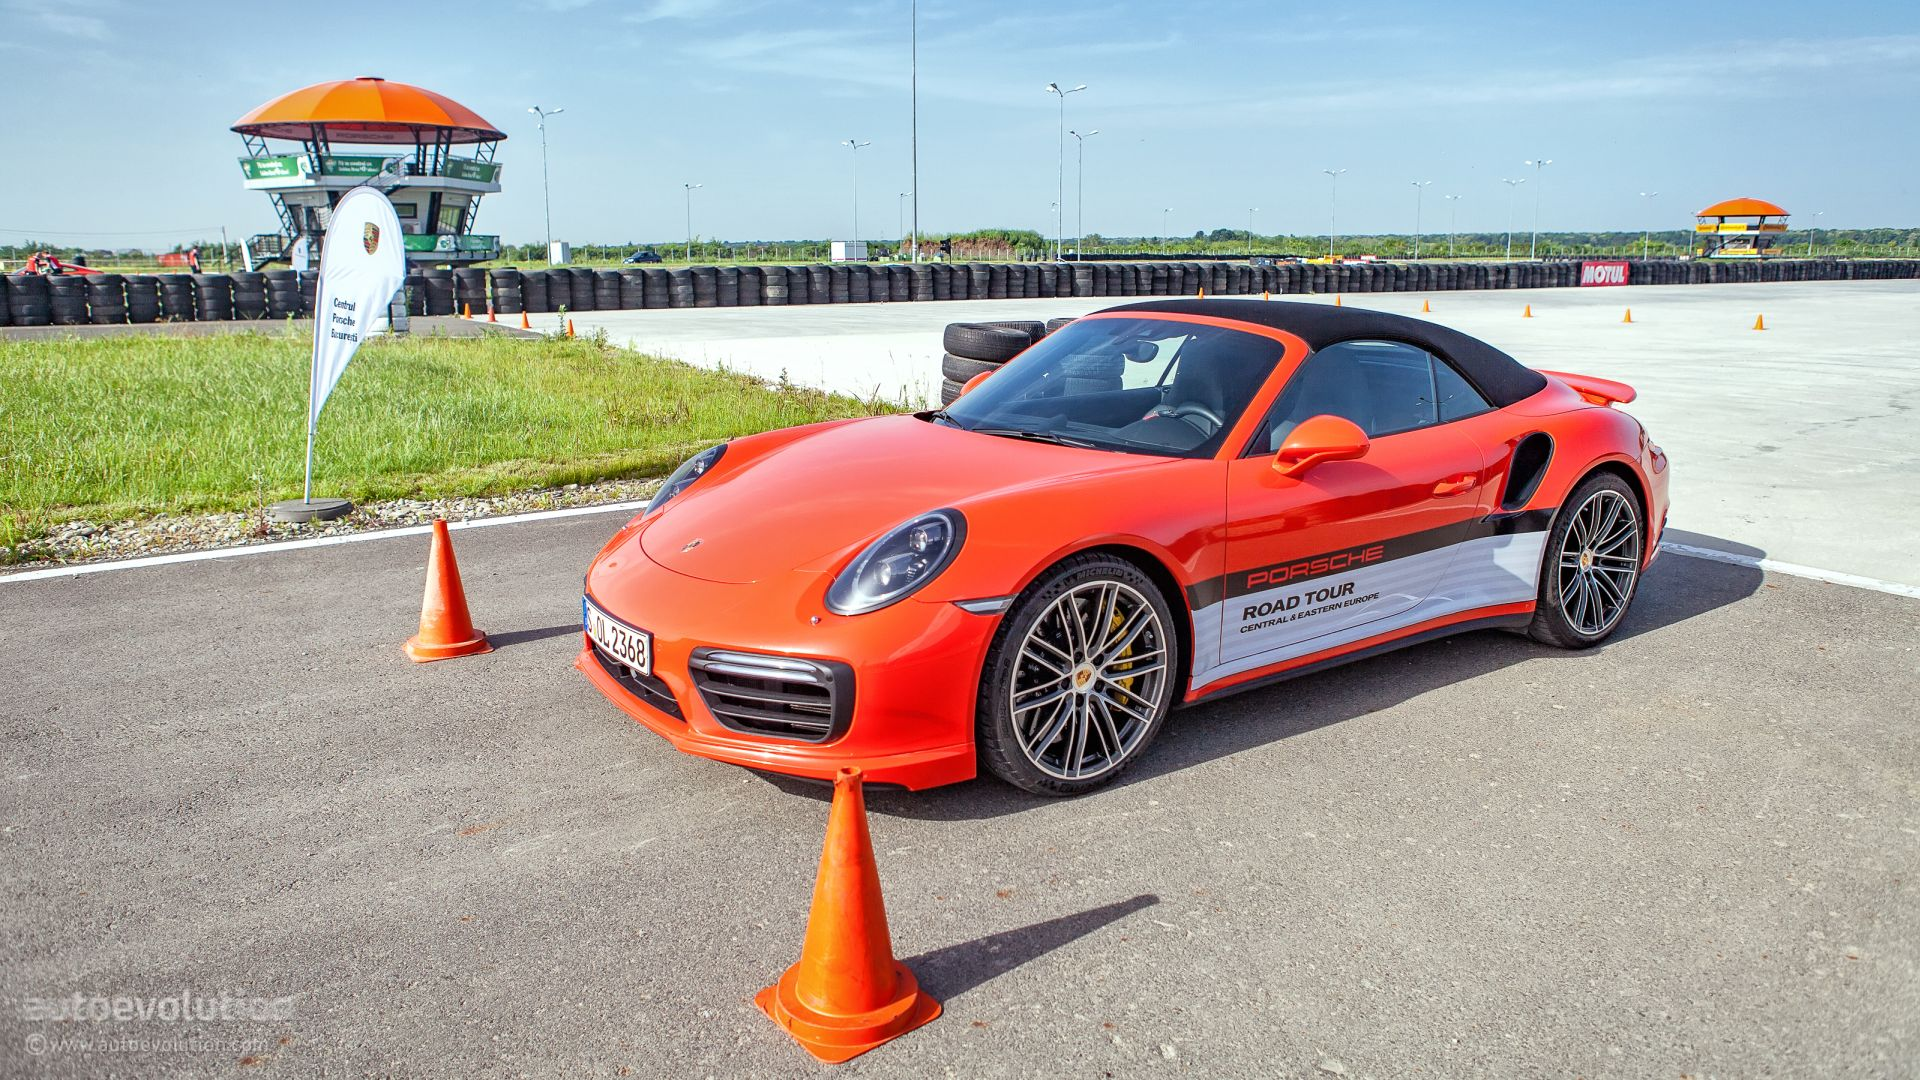 2016-porsche-9912-track-stint-carrera-4s-supercar-laps-911-turbo-s-launches_46 Exciting Porsche 911 Gt2 La Centrale Cars Trend